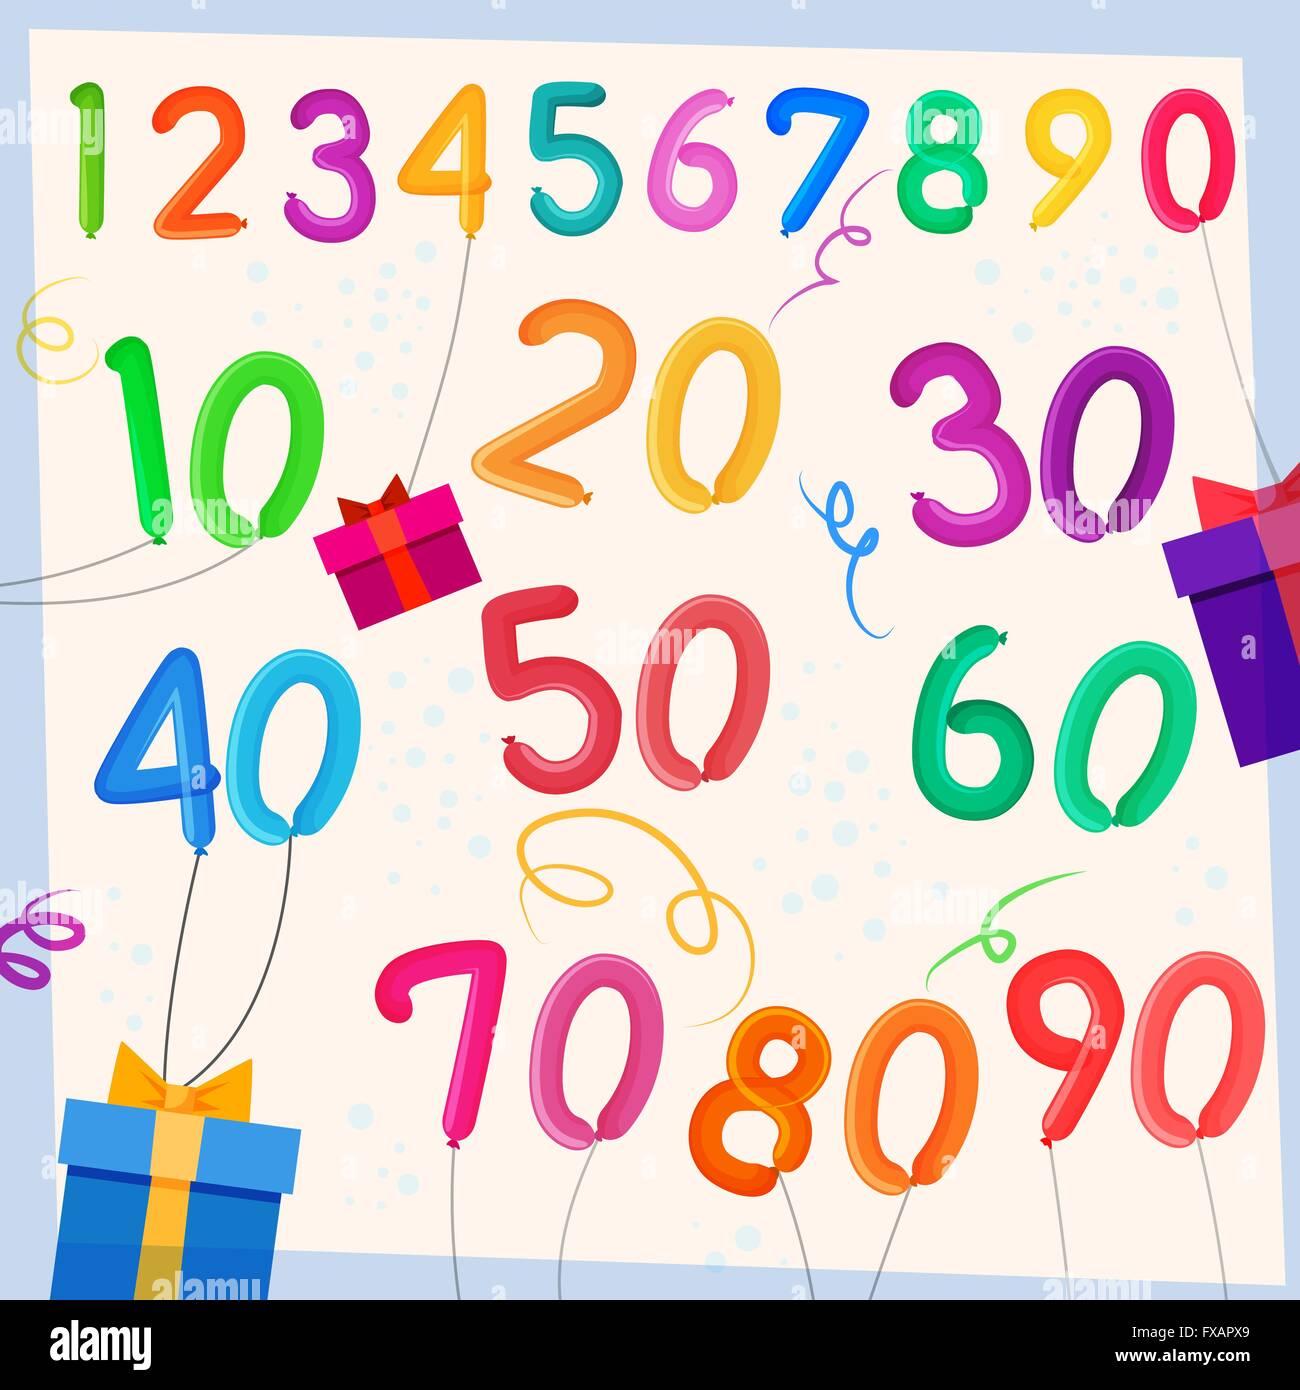 Anniversary balloons background - Stock Vector